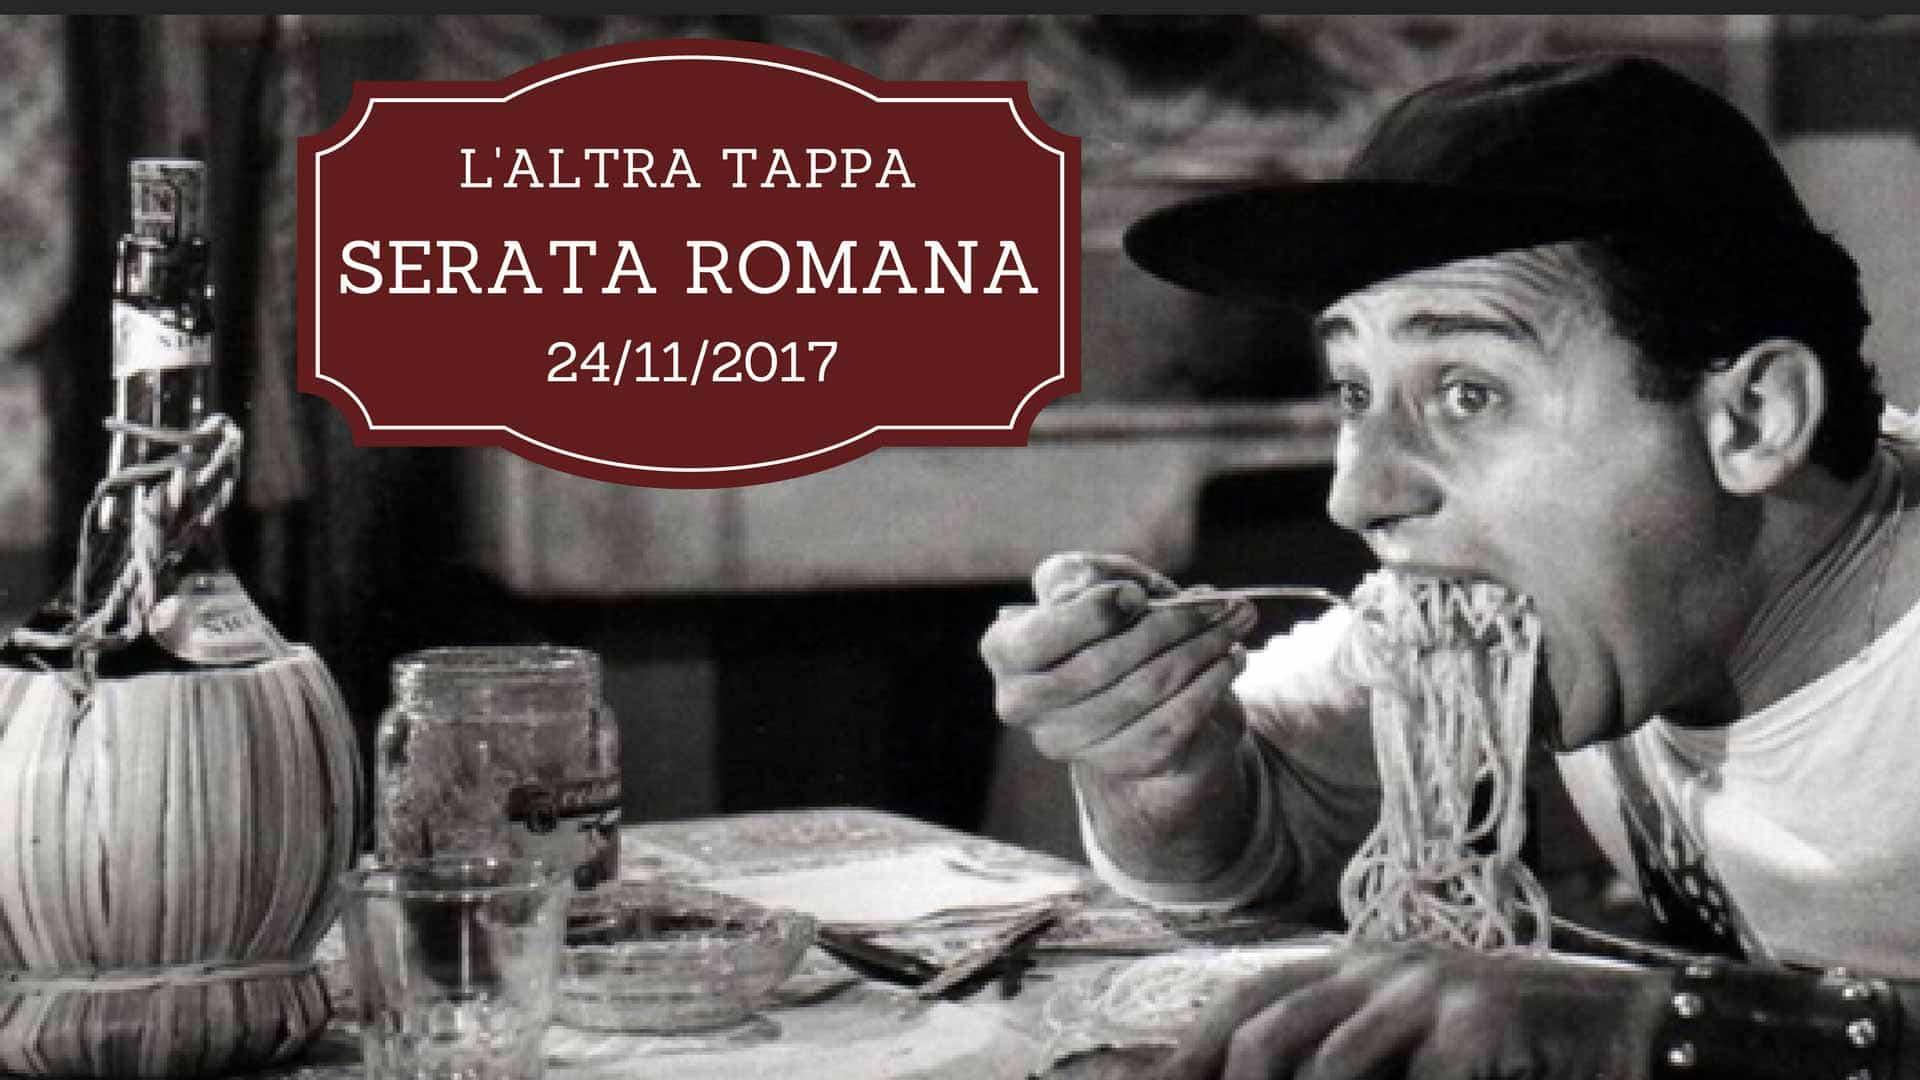 Serata_Romana_ok